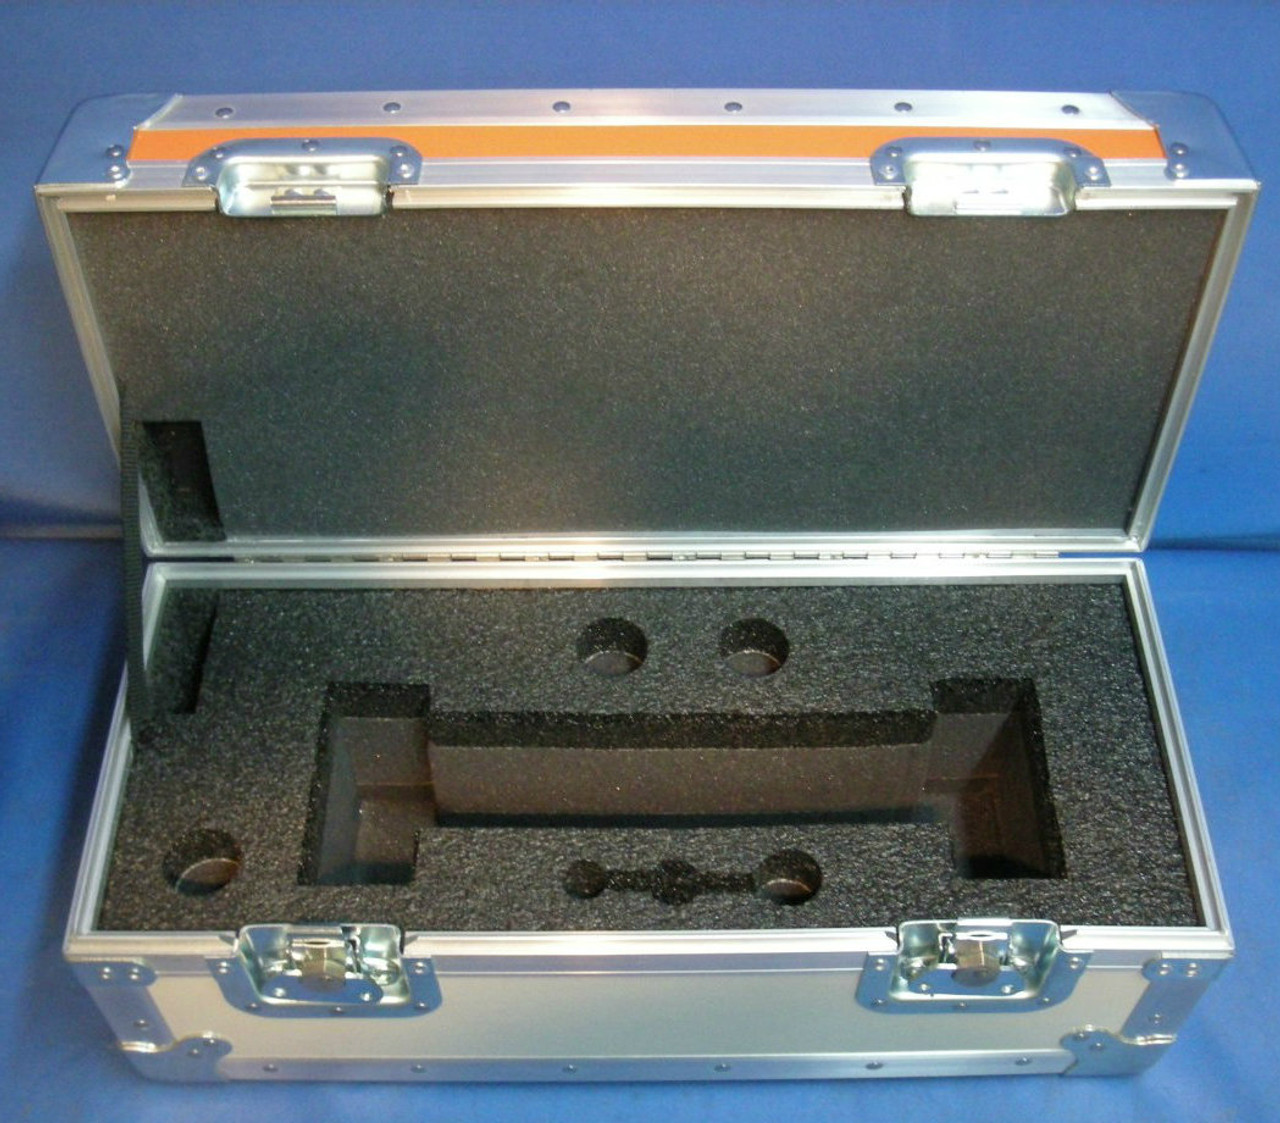 Arriflex Follow Focus 5 Custom ATA Shipping Case - Interior View